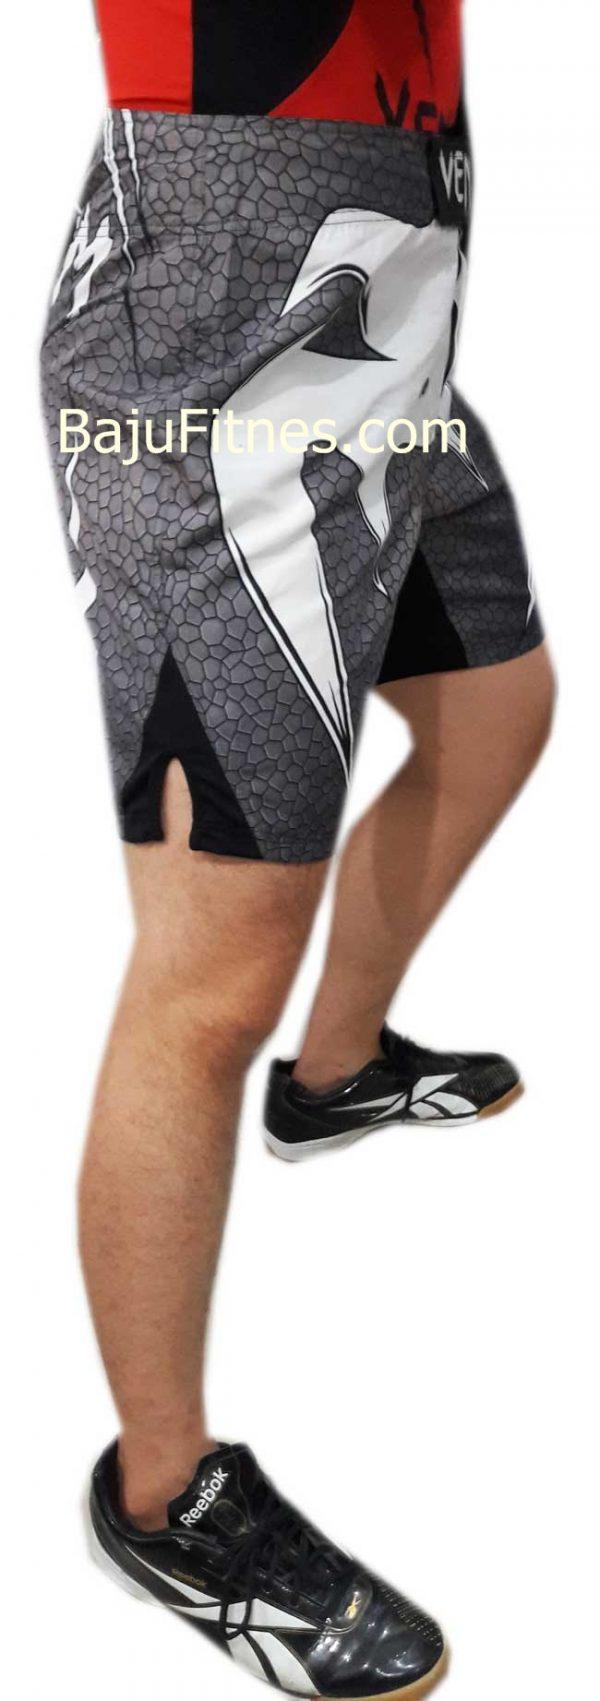 089506541896 Tri | 2113 Beli Celana Untuk FitnesDi Indonesia